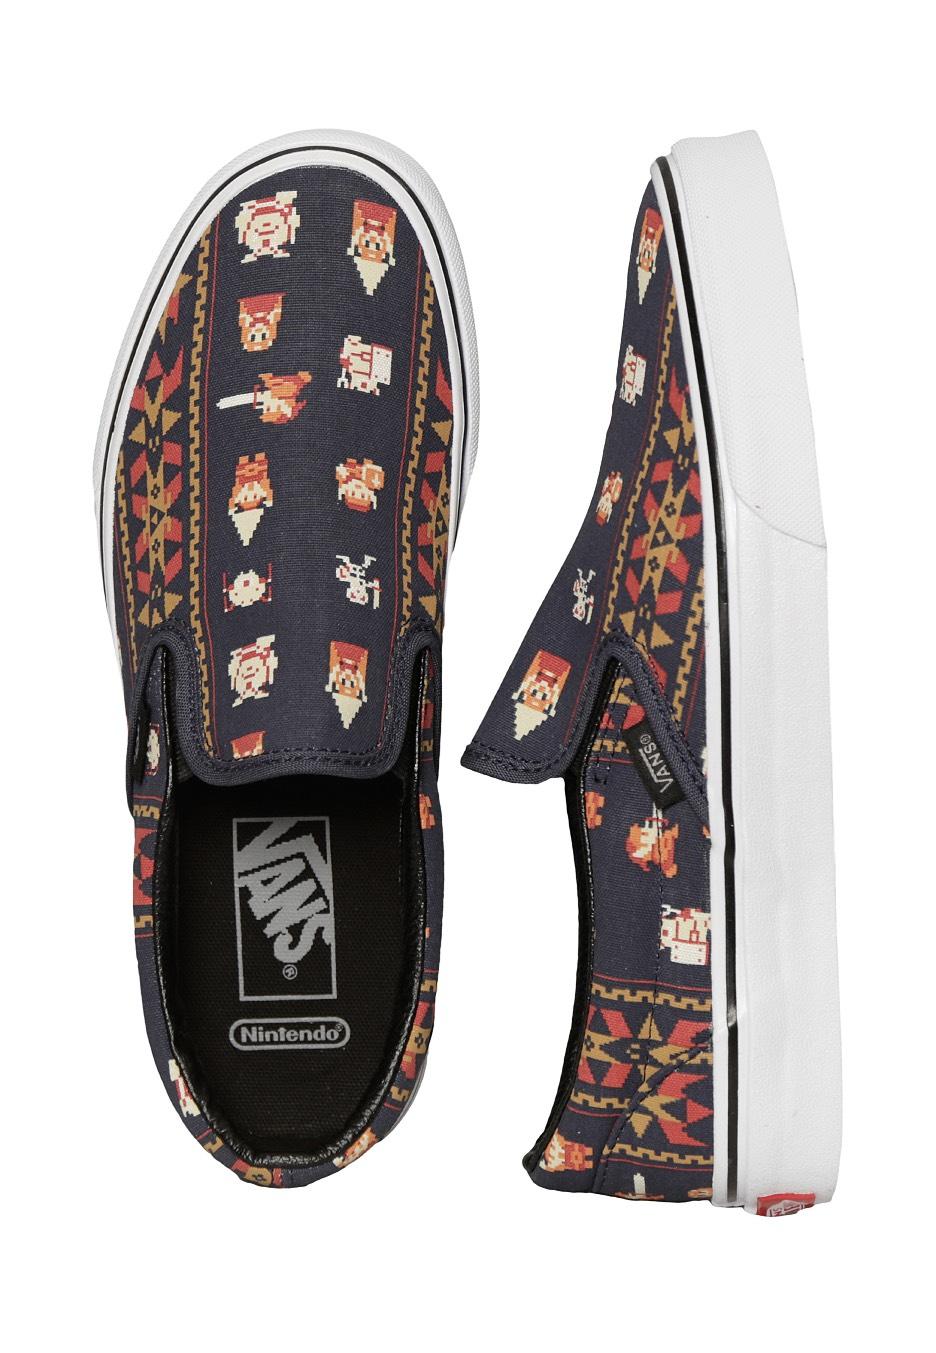 7e591779fc0 Vans X Nintendo - Classic Slip-On Nintendo Zelda Parisian Night - Girl  Shoes - Impericon.com UK